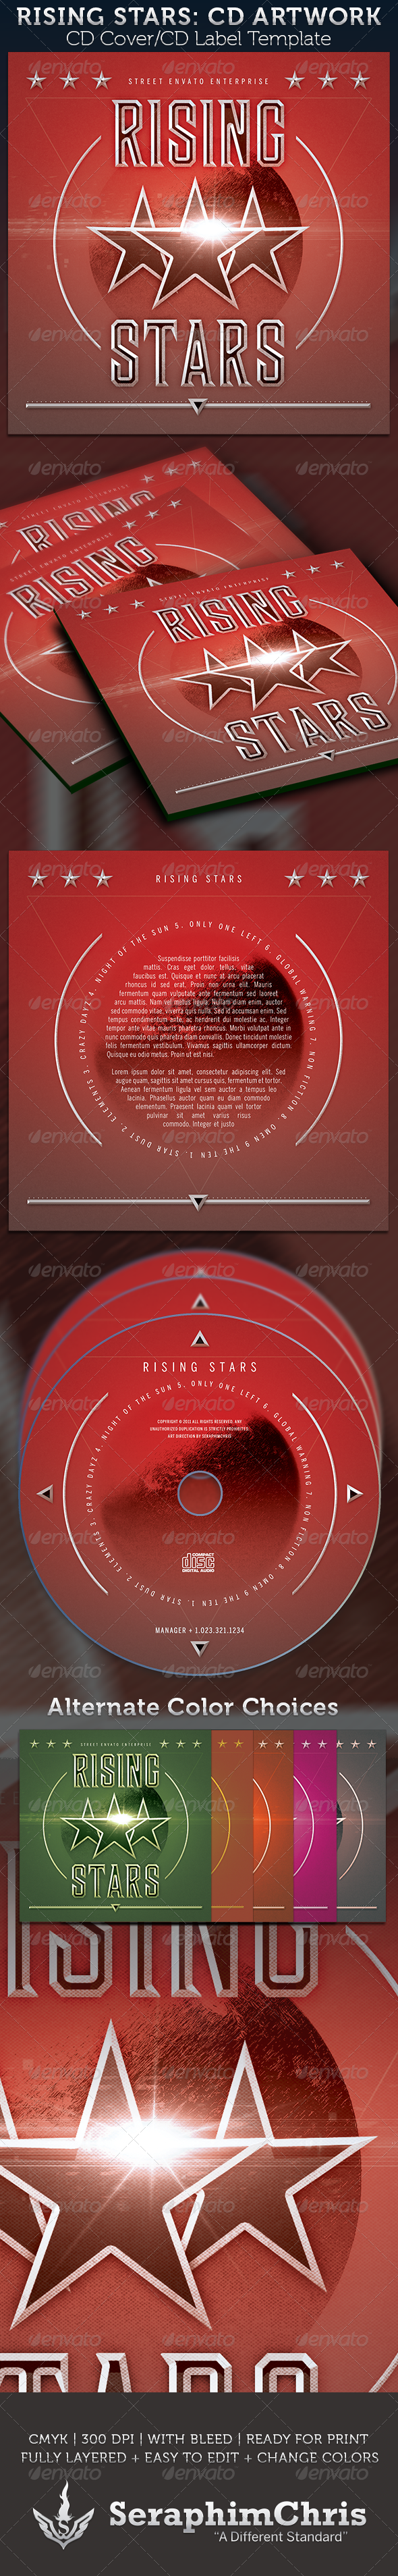 Rising Stars: CD Cover Artwork Template - CD & DVD Artwork Print Templates